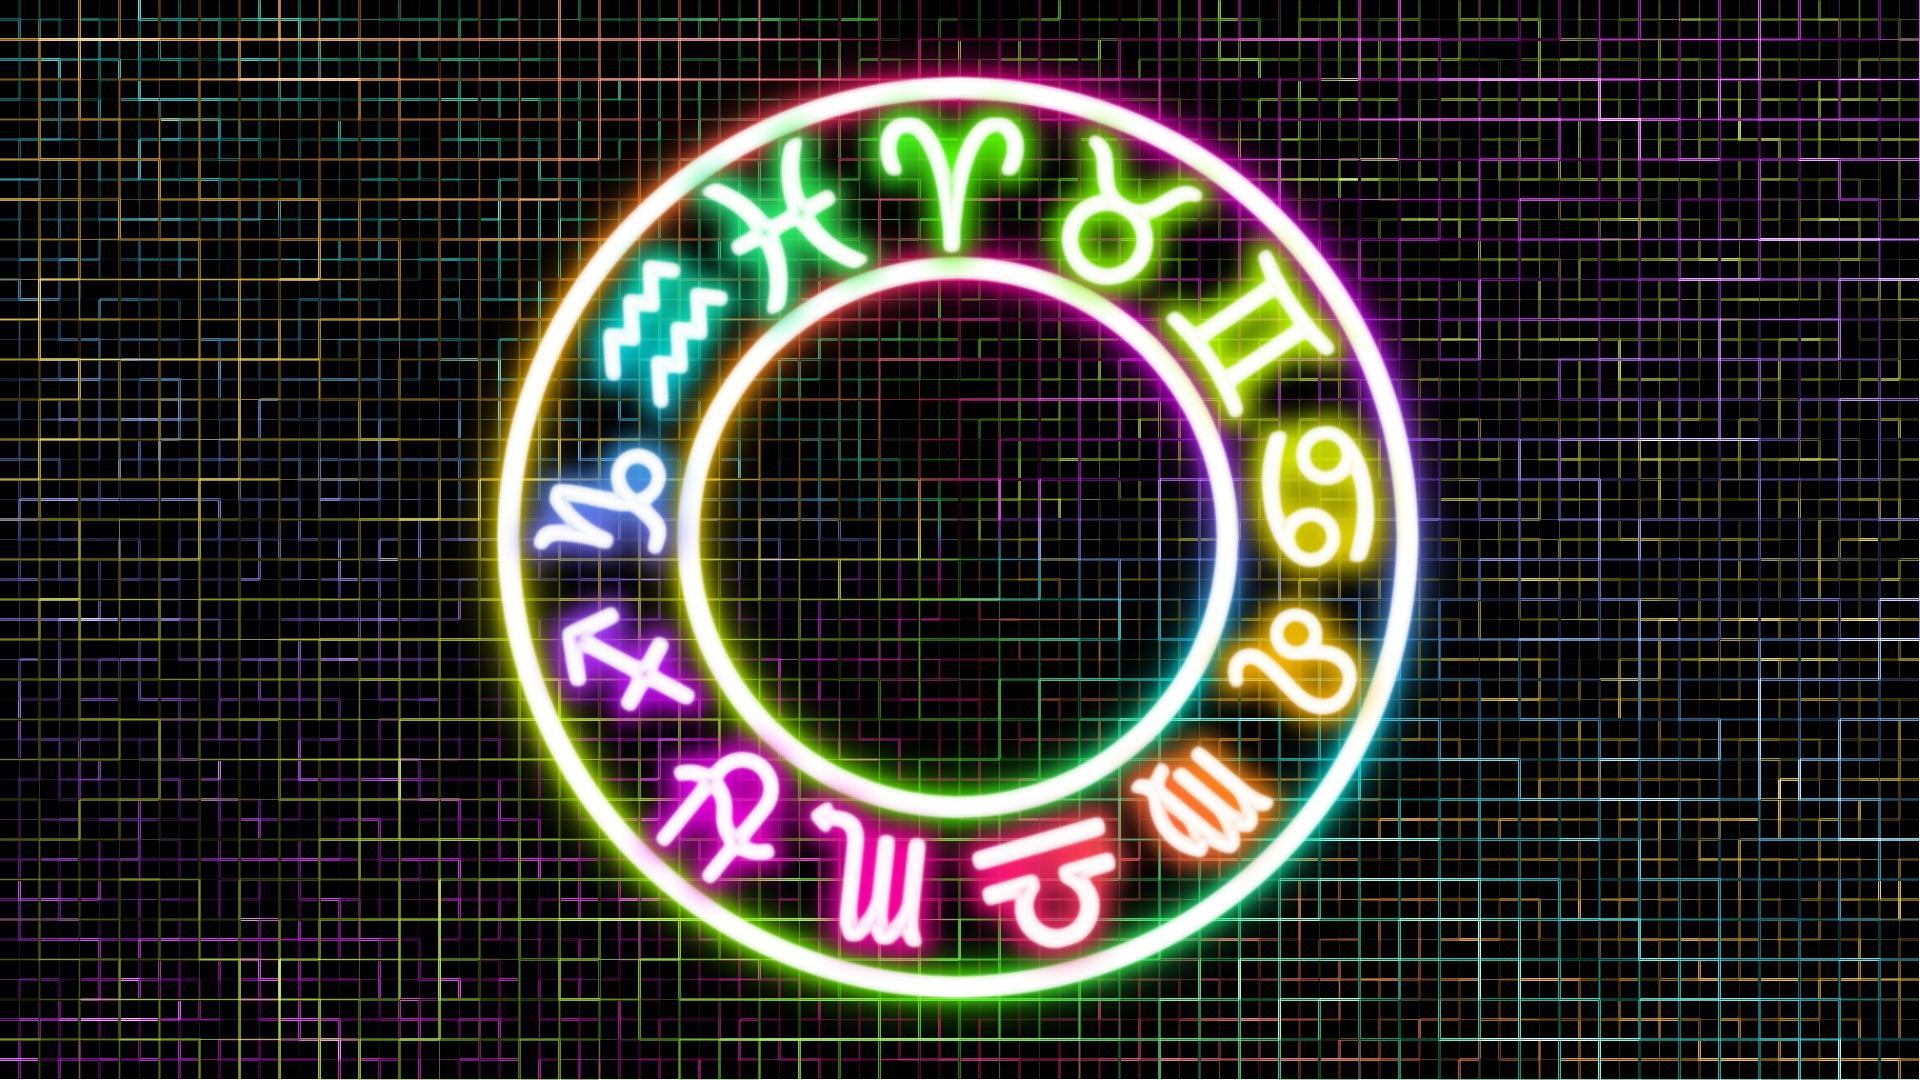 Horoscope Hd Wallpapers Astrology Desktop Background Pixelstalk Net